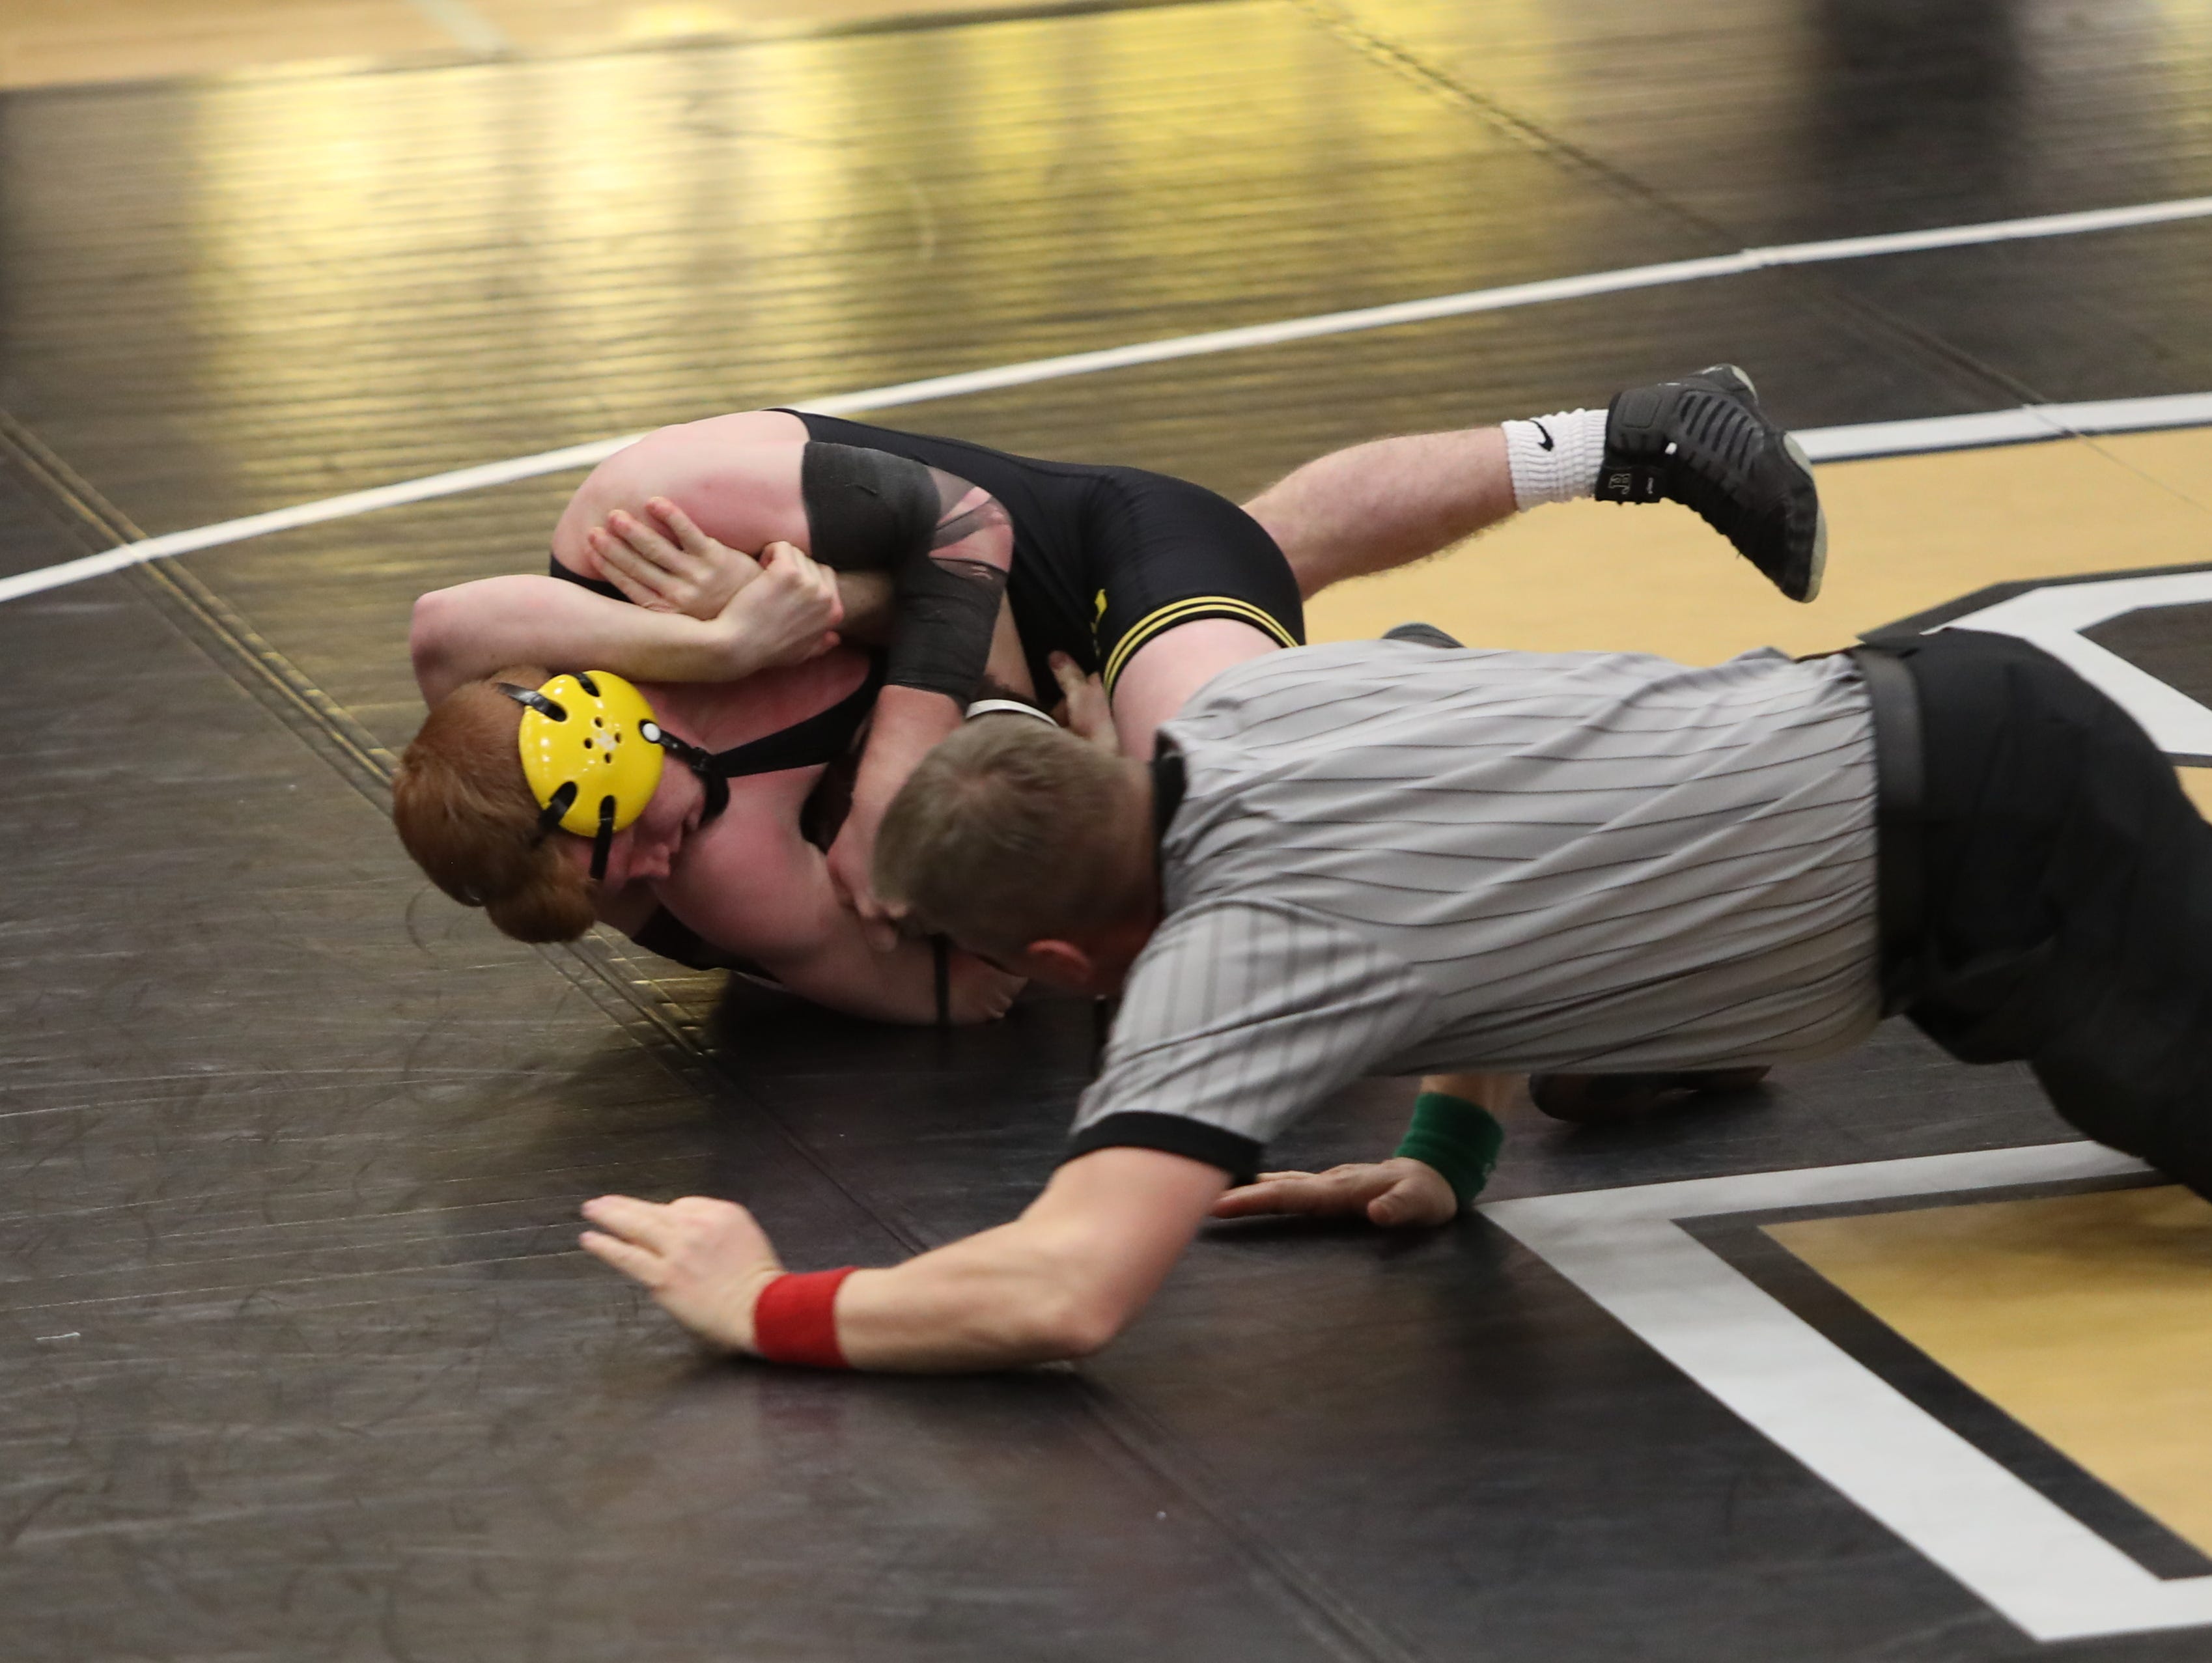 Southeast Polk's Ryan Strickland pins Ankeny's Wyatt Carl in their 145-pound match in 1:16. Southeast Polk defeated Ankeny 57-17 in a Class 3A regional dual Feb. 6 at Southeast Polk.